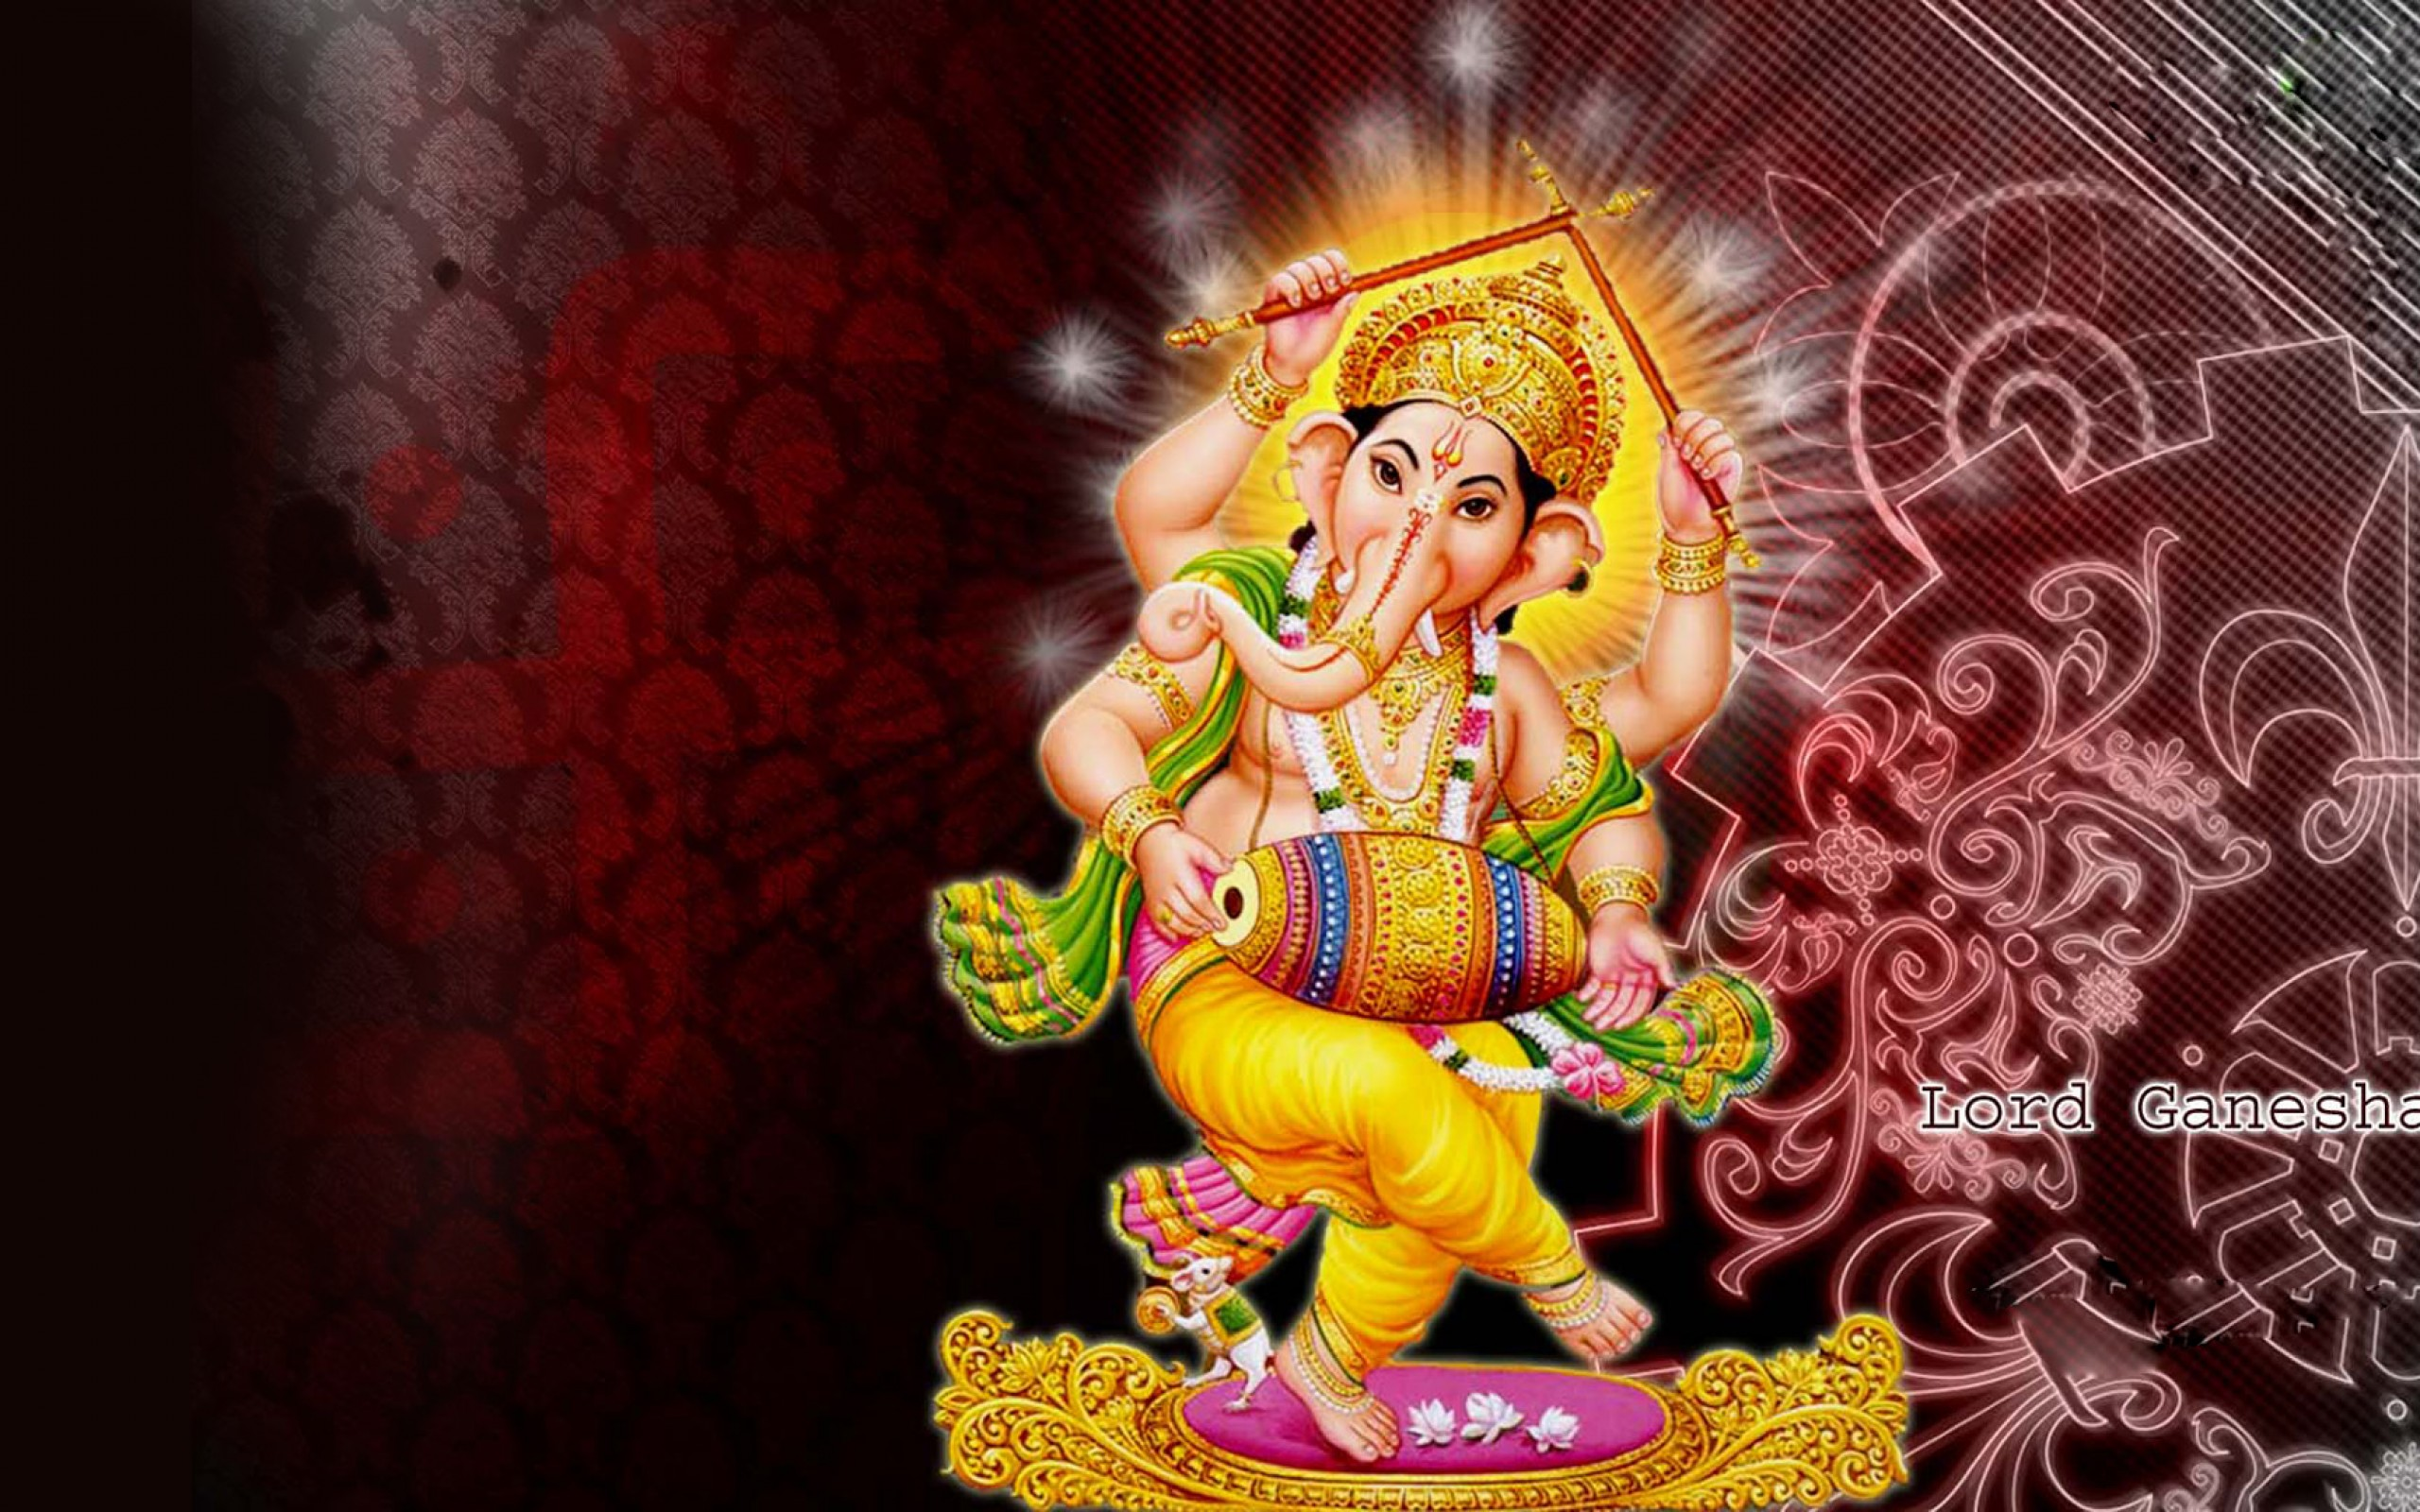 Desktop Wallpaper Hd 3d Full Screen God Ganesh Lord Ganesha Hd Wallpaper Wallpapers Trend